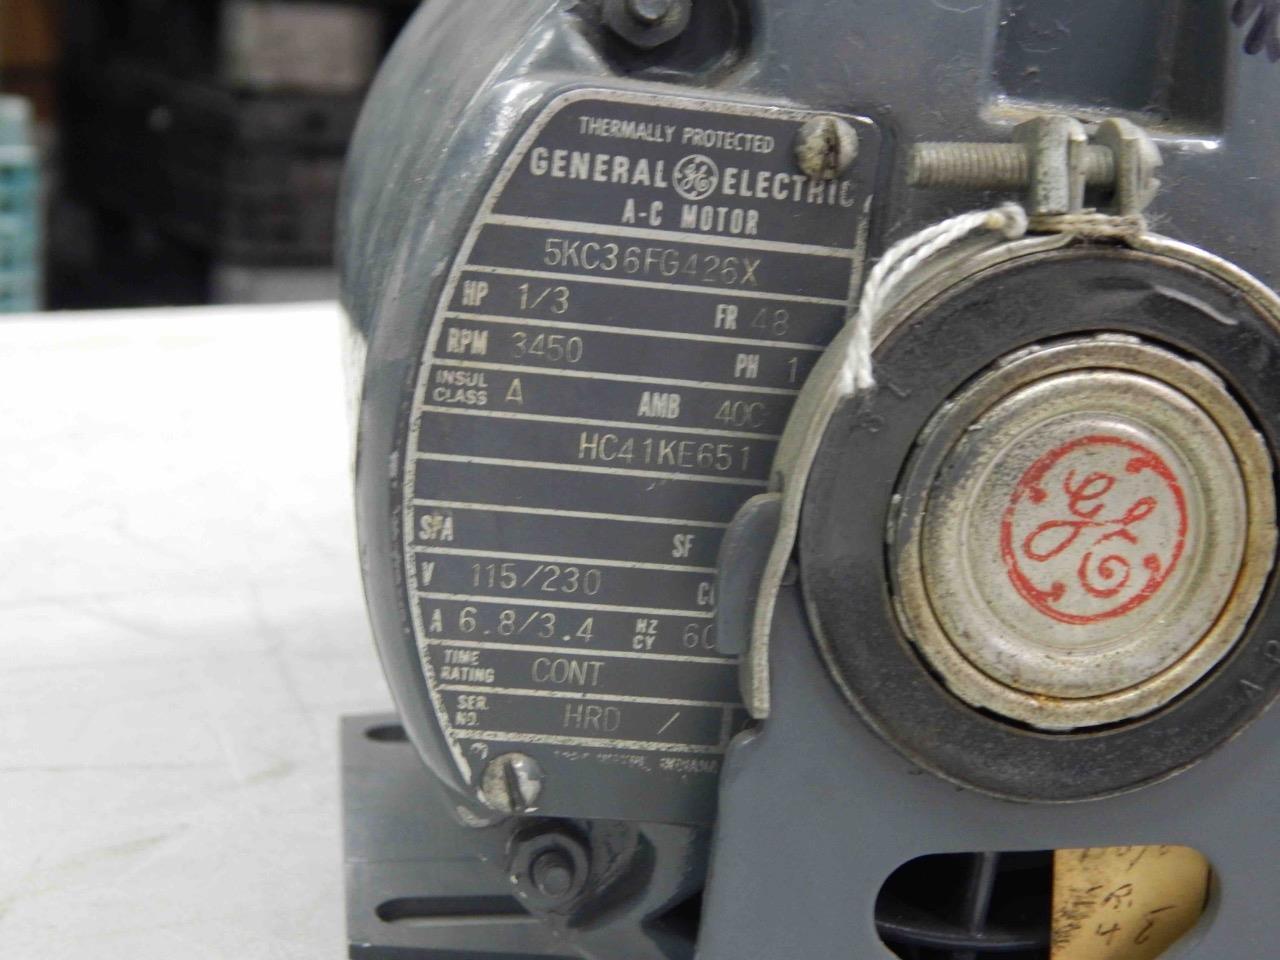 Ge Ac Motor Catalog Induction Wiring Diagram 5 General Electric Hc41ke651 1 3hp Fr 48 3450 Rpm 115